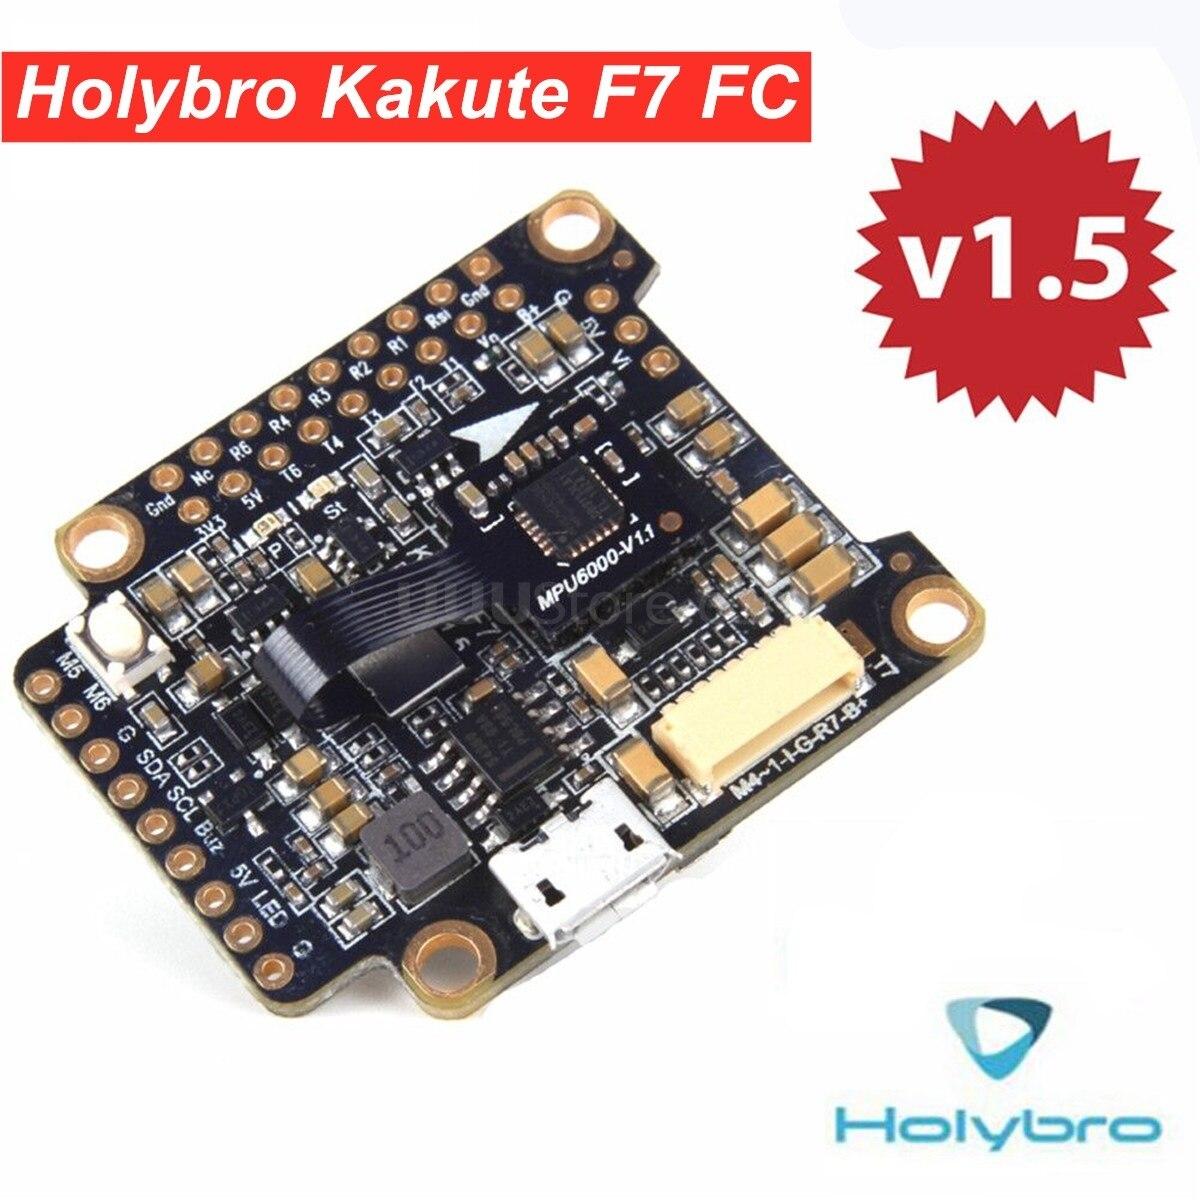 Holybro-transmisor de vídeo Holybro Atlatl HV V2 5,8G, F7 V1.5 FC, Holybro Tekko32, 4 en 1, 35A, ESC, Combo para Dron RC FPV